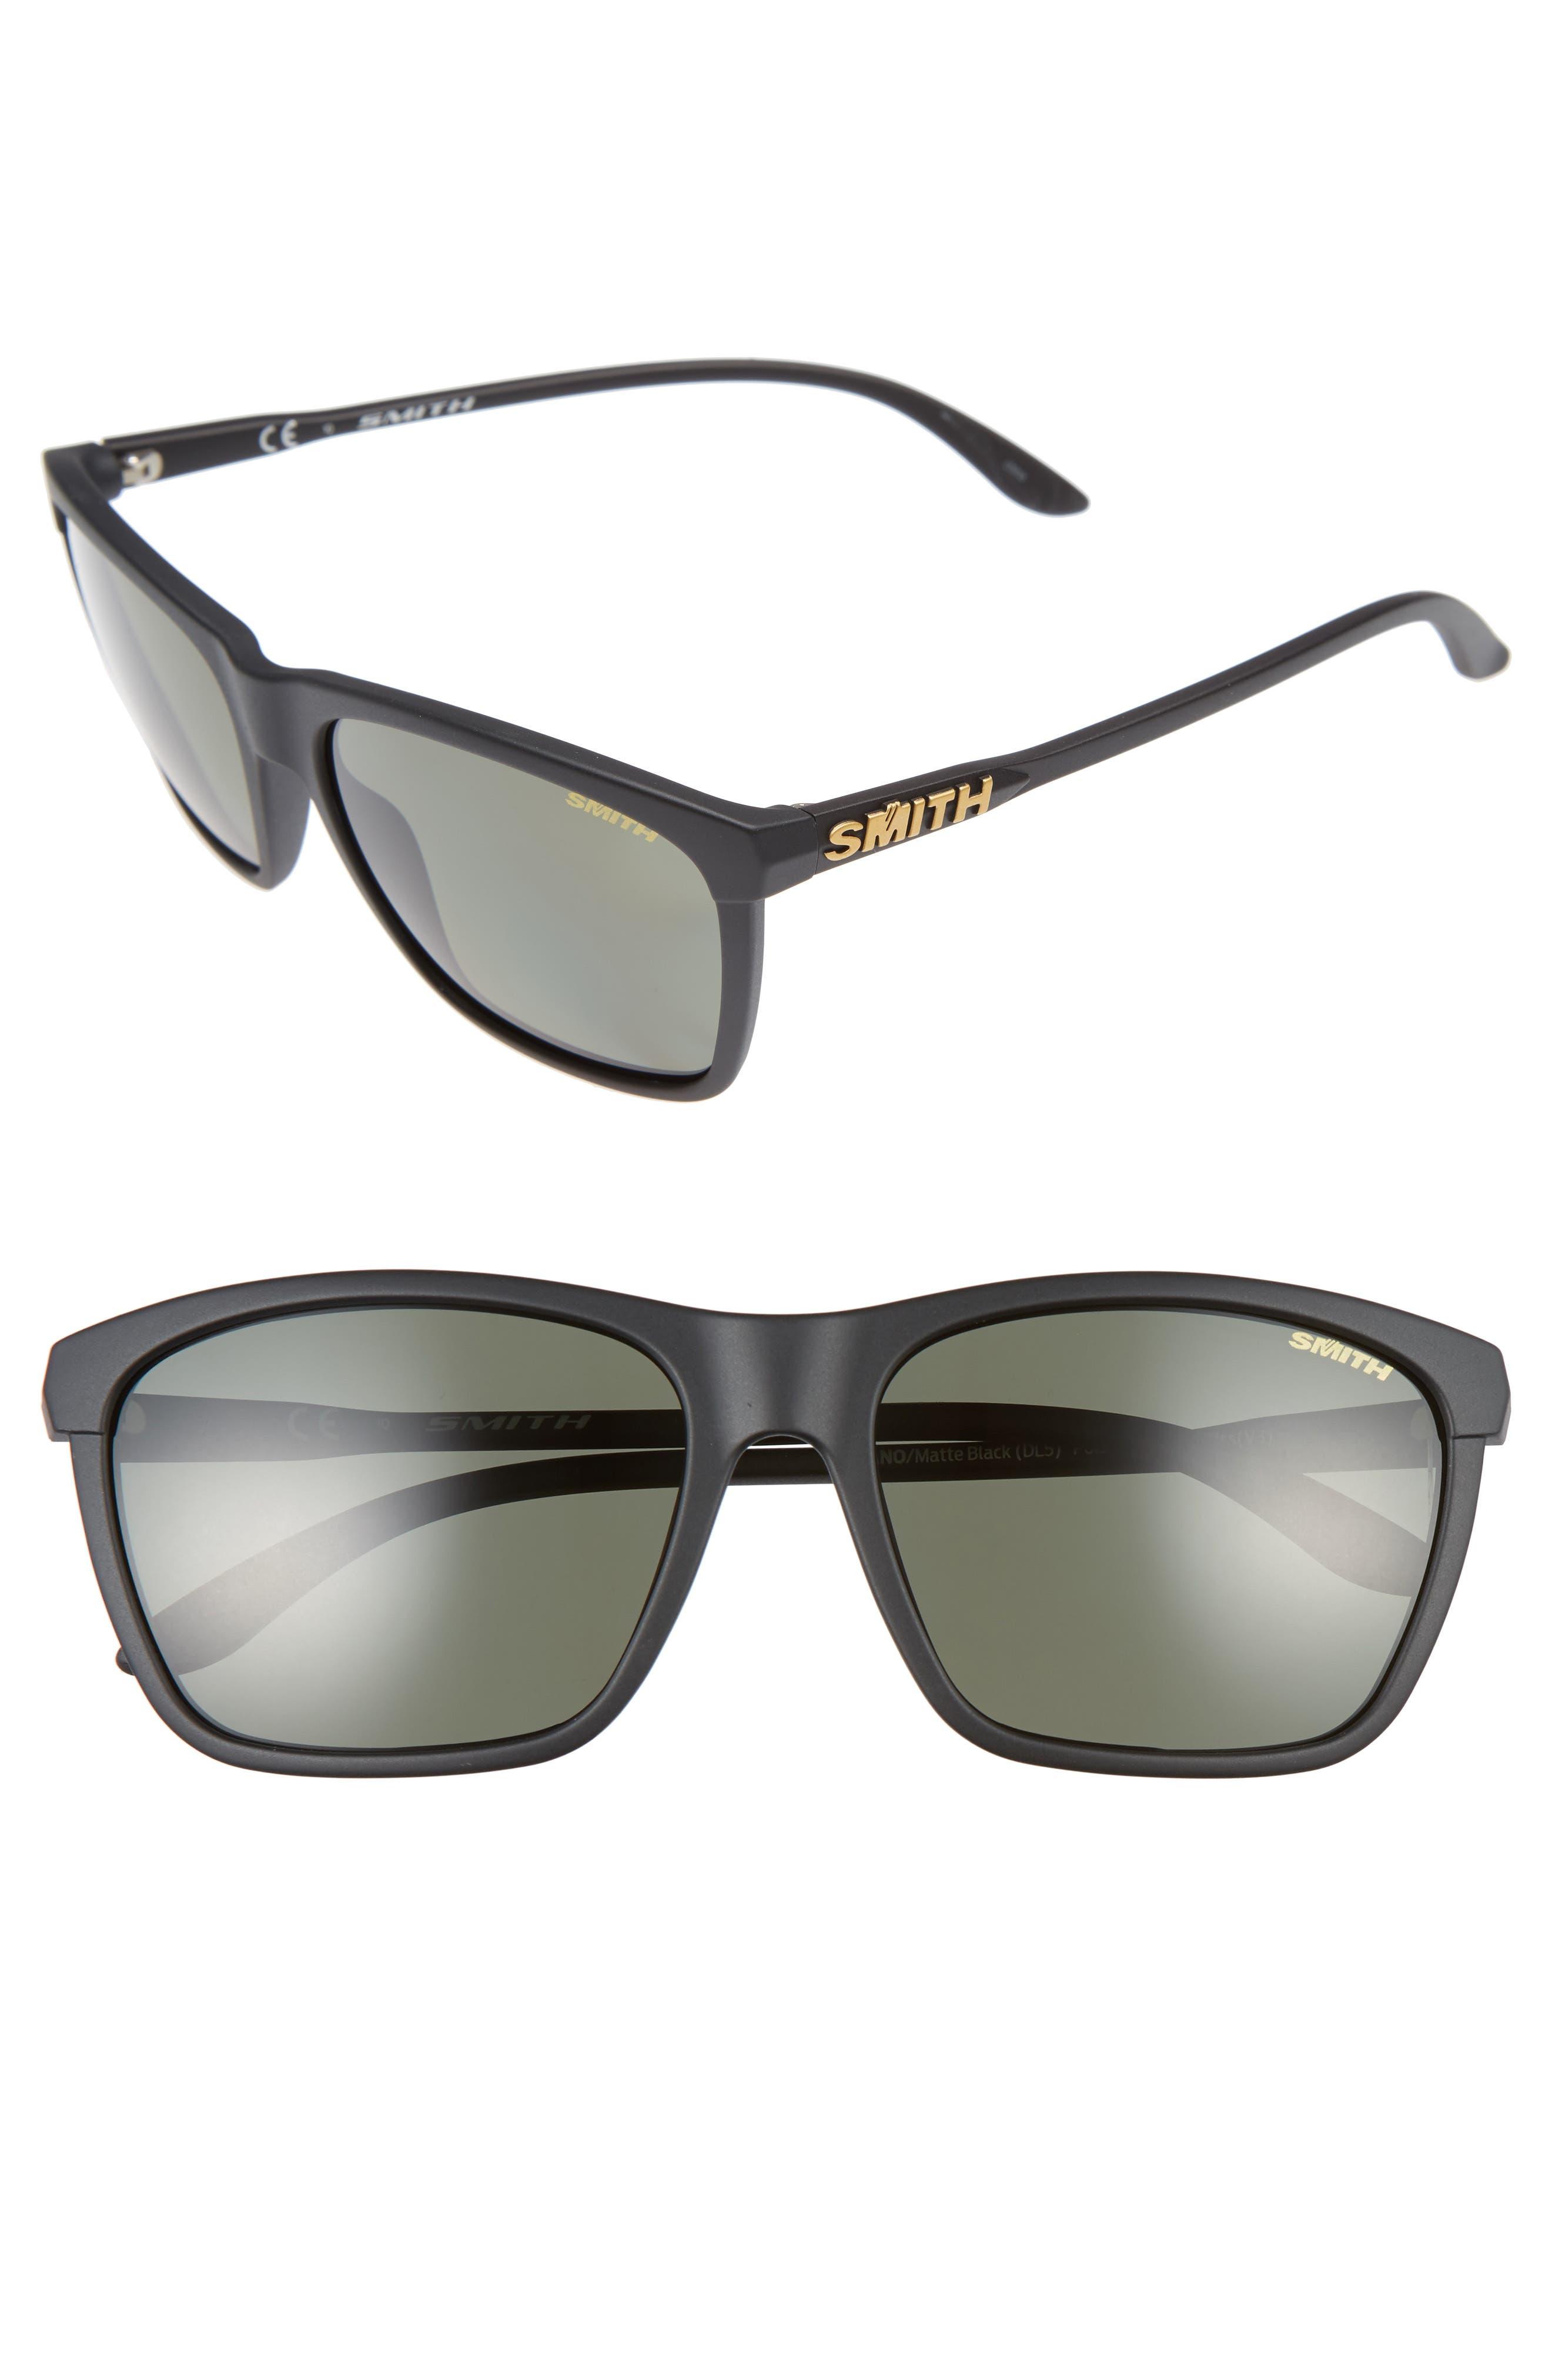 Delano 57mm Sunglasses,                             Alternate thumbnail 2, color,                             001